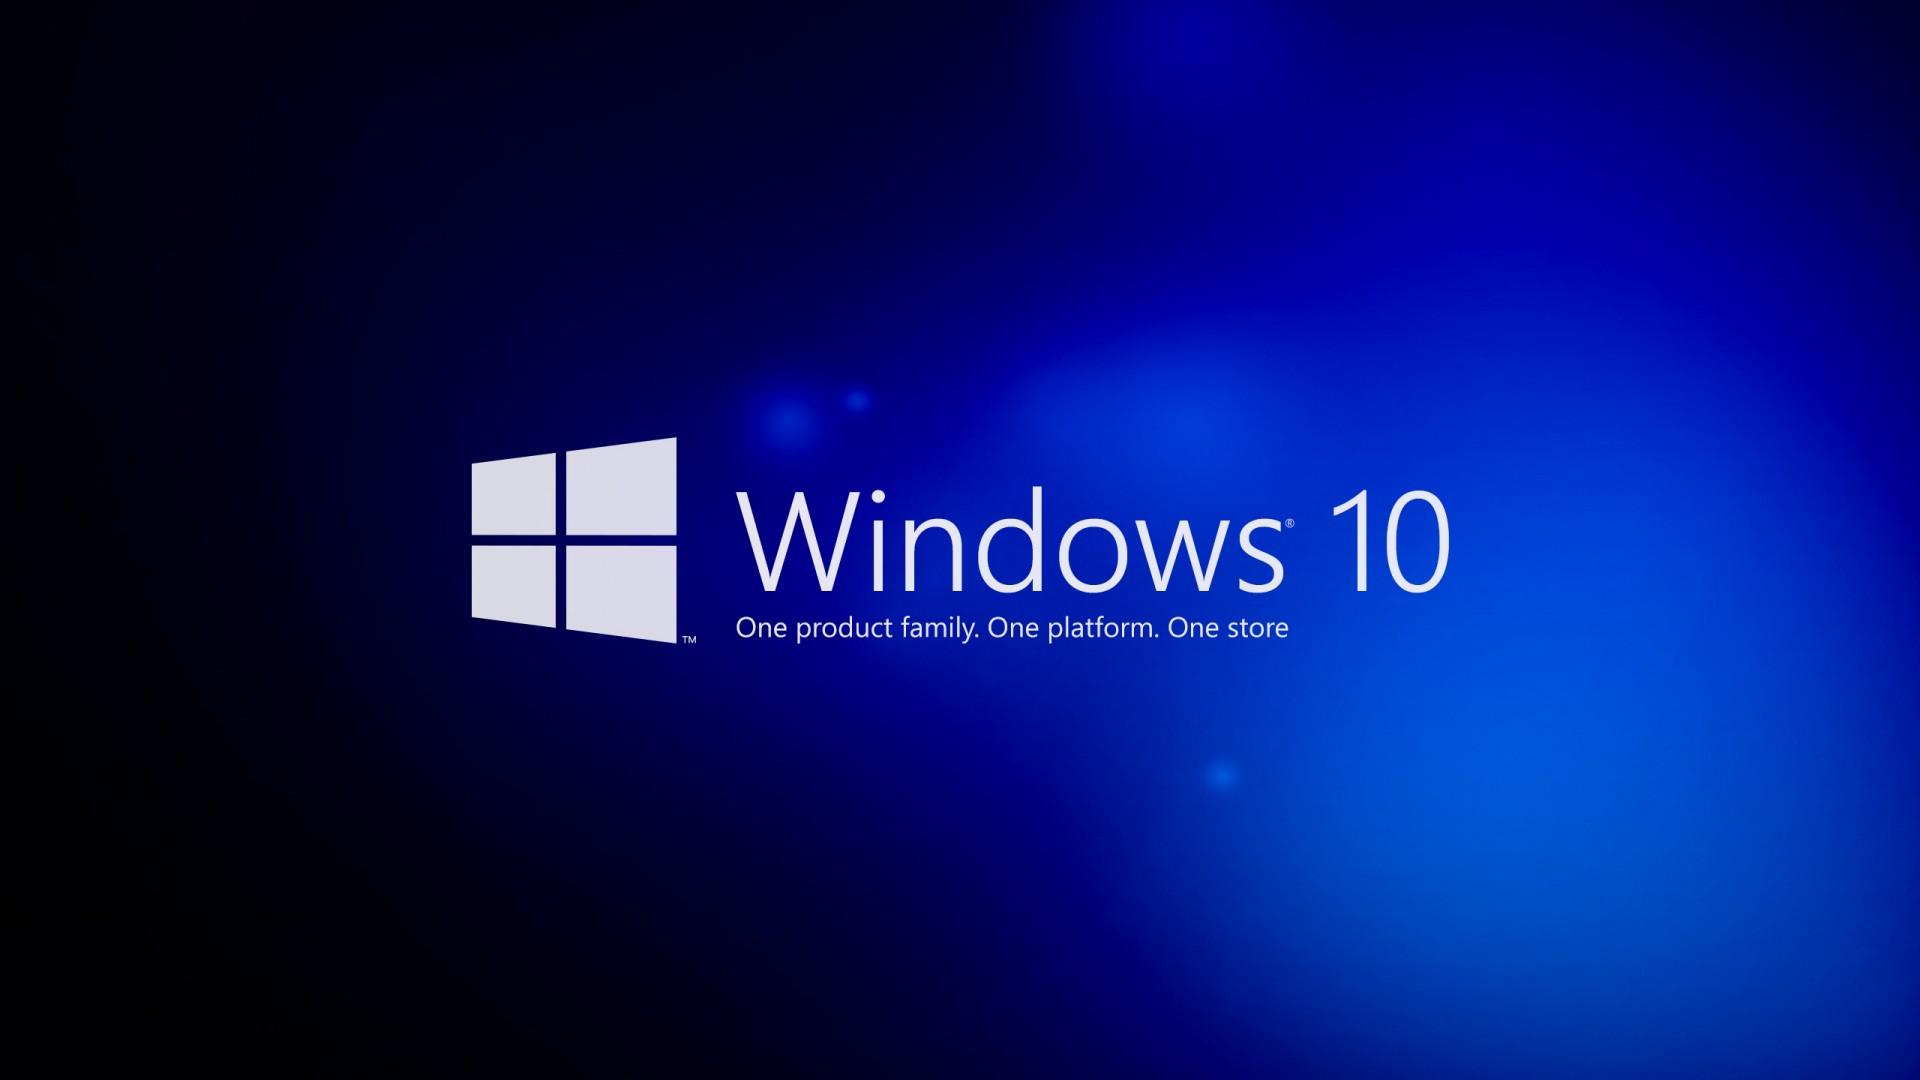 windows 10 wallpaper 1920x1080 1080p   Wallpaper   Wallpaper Style 1920x1080